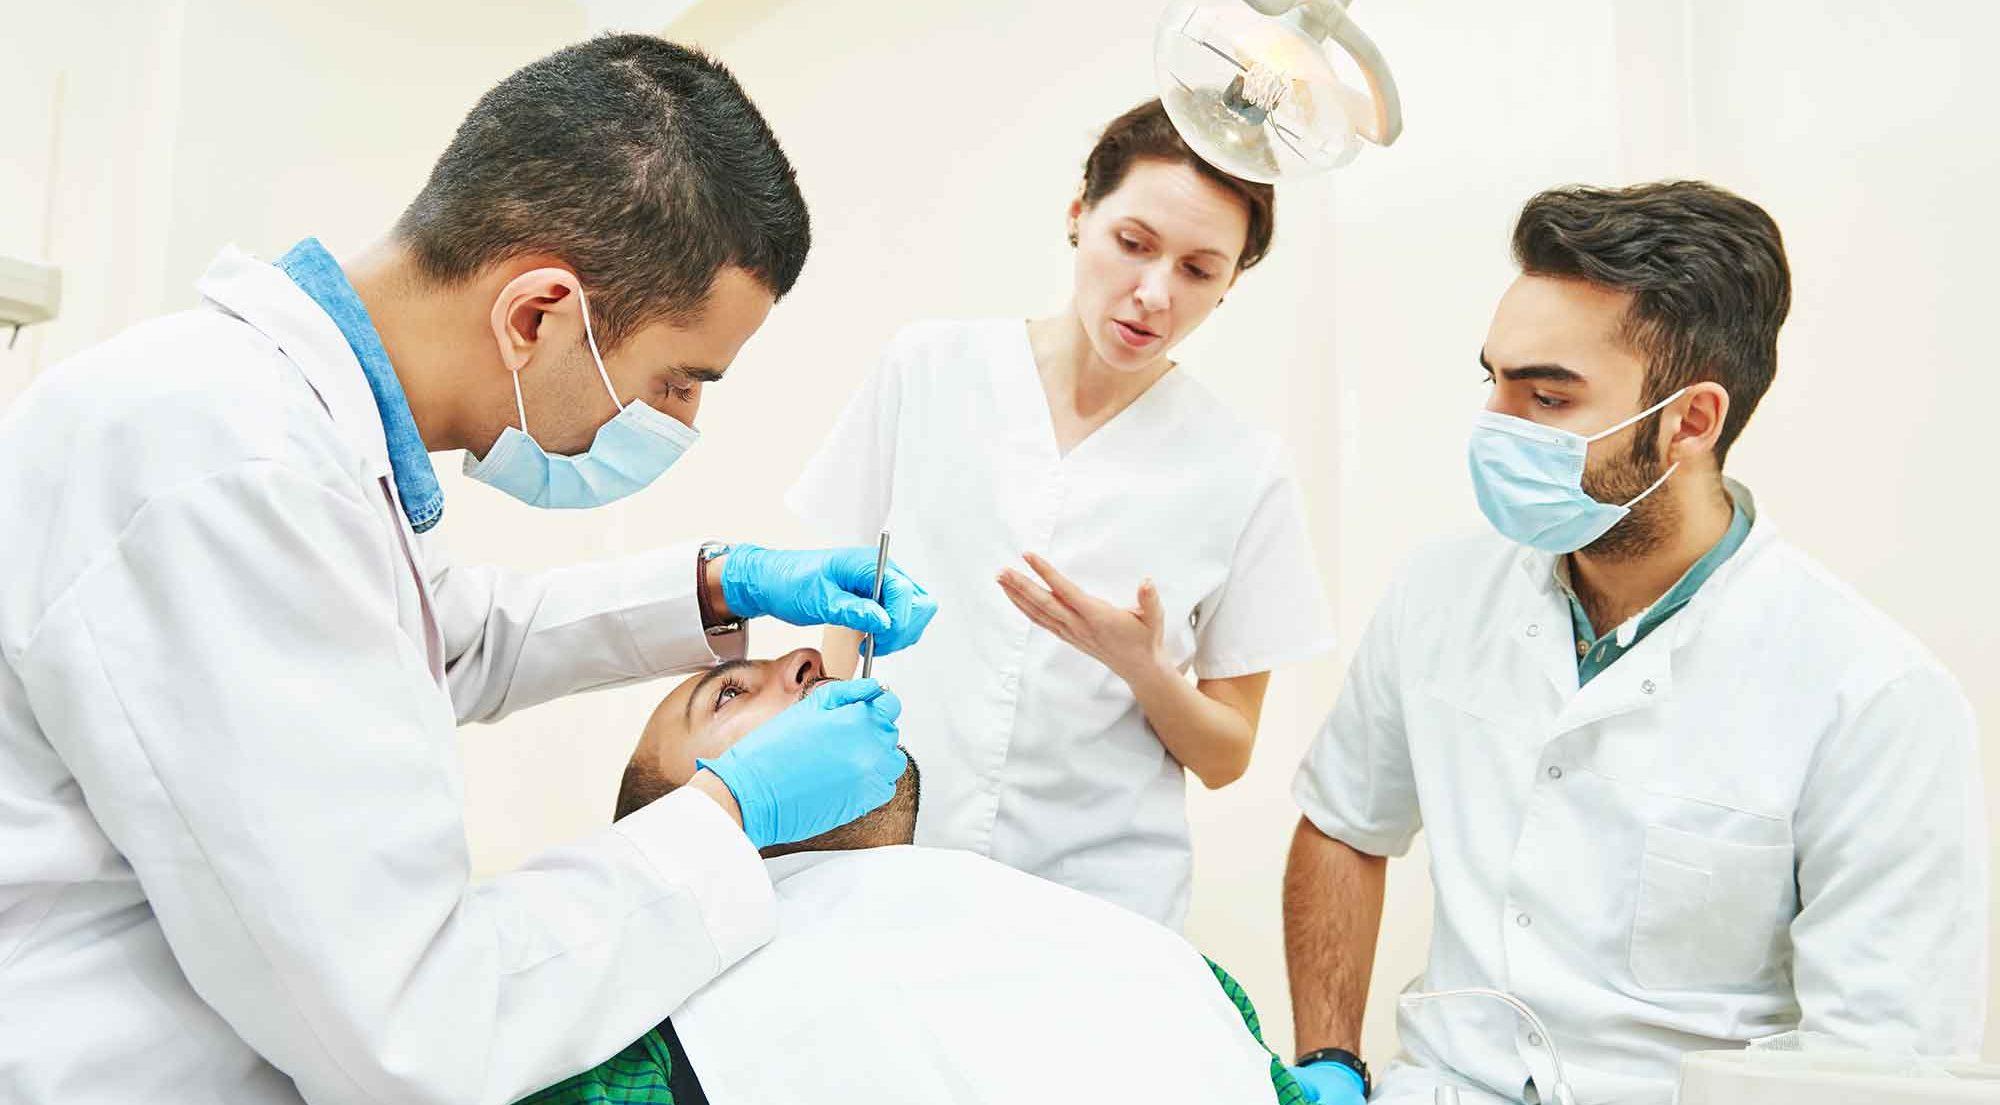 Education supervisor in dentistry